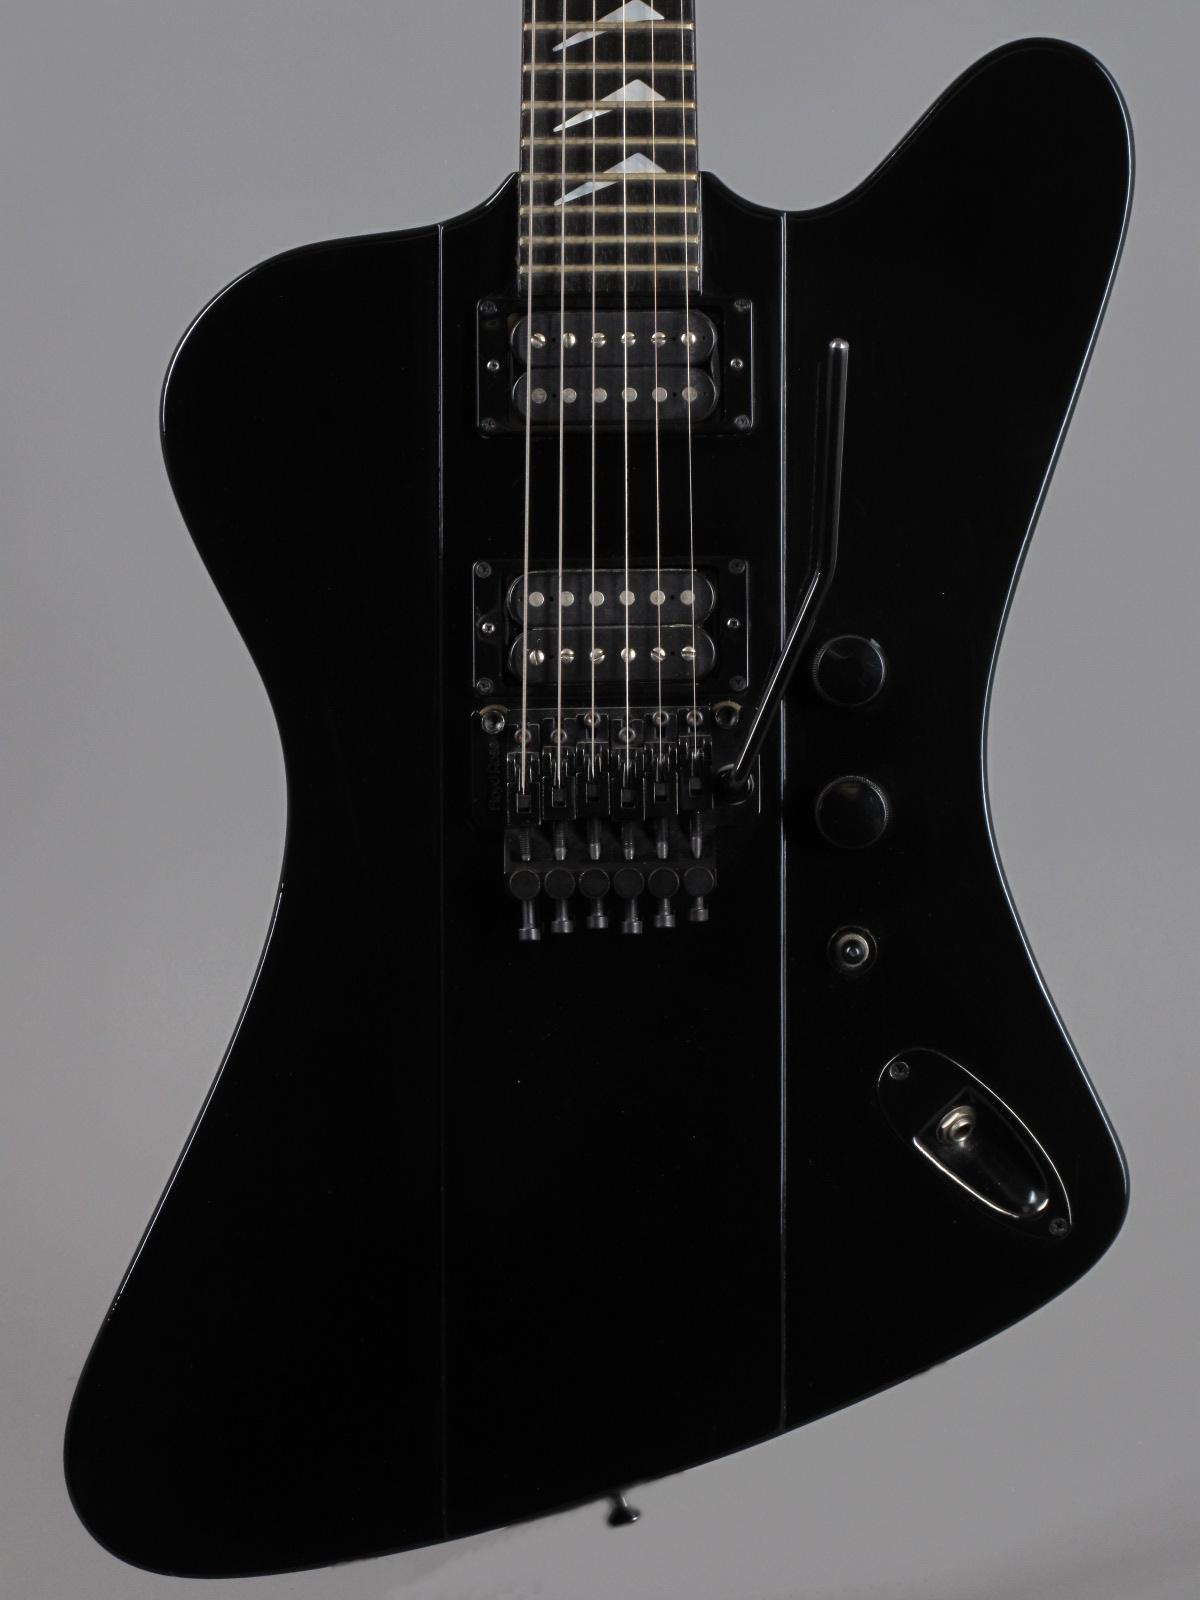 1987 Hamer Firebird II - Black